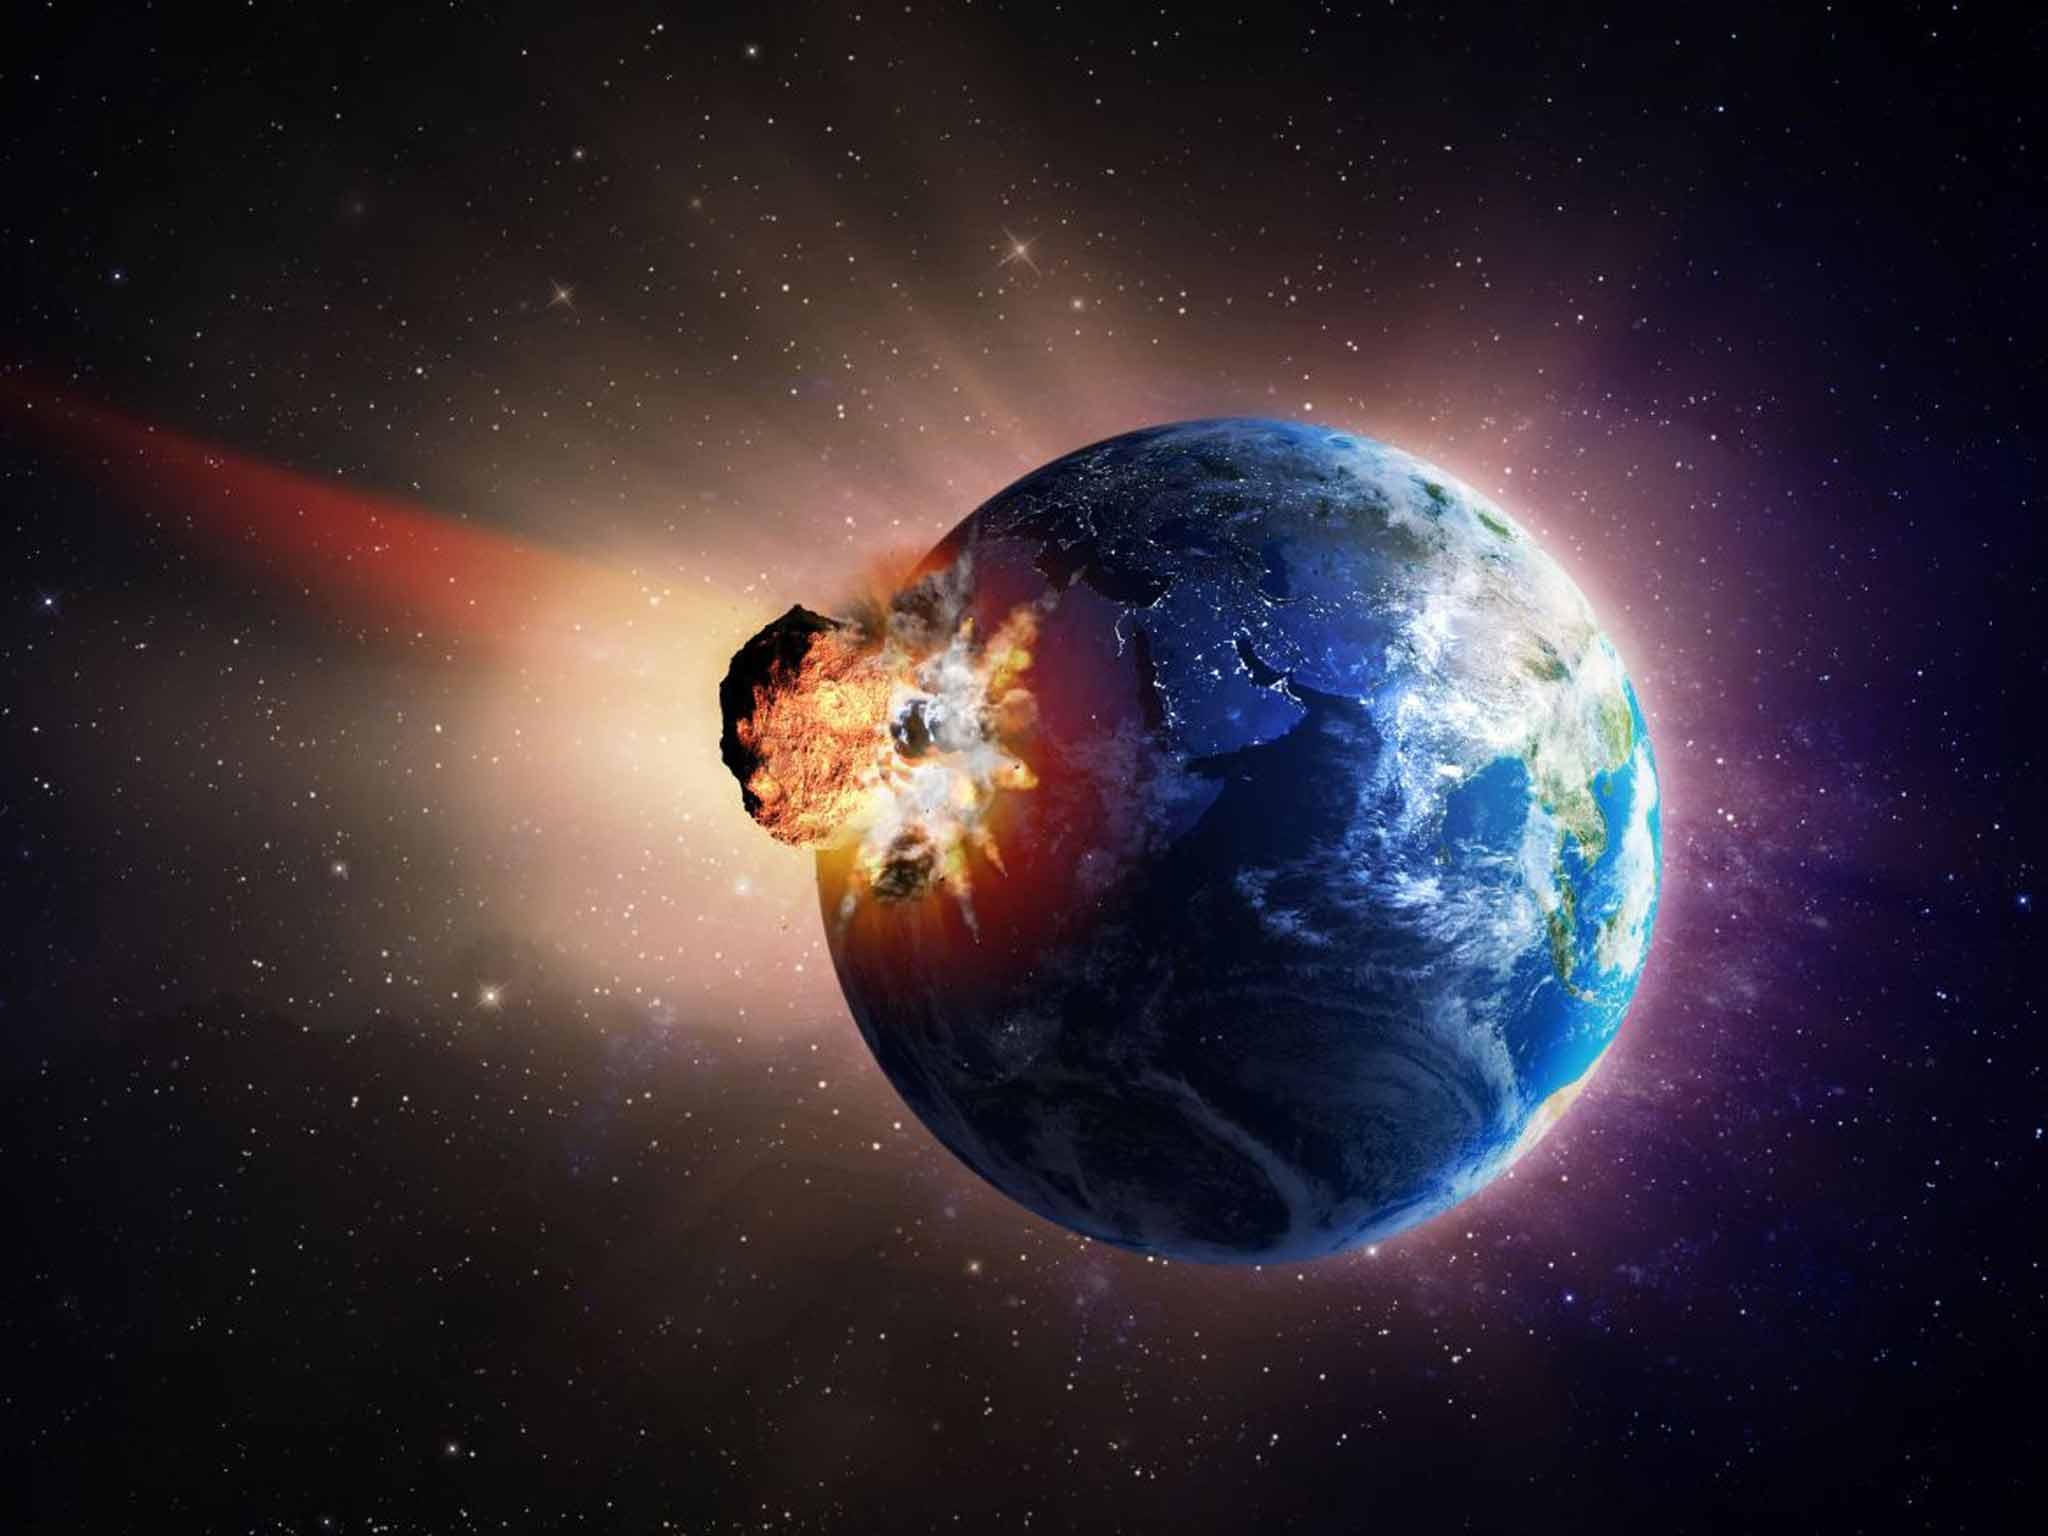 nasa comet collision - HD1600×900